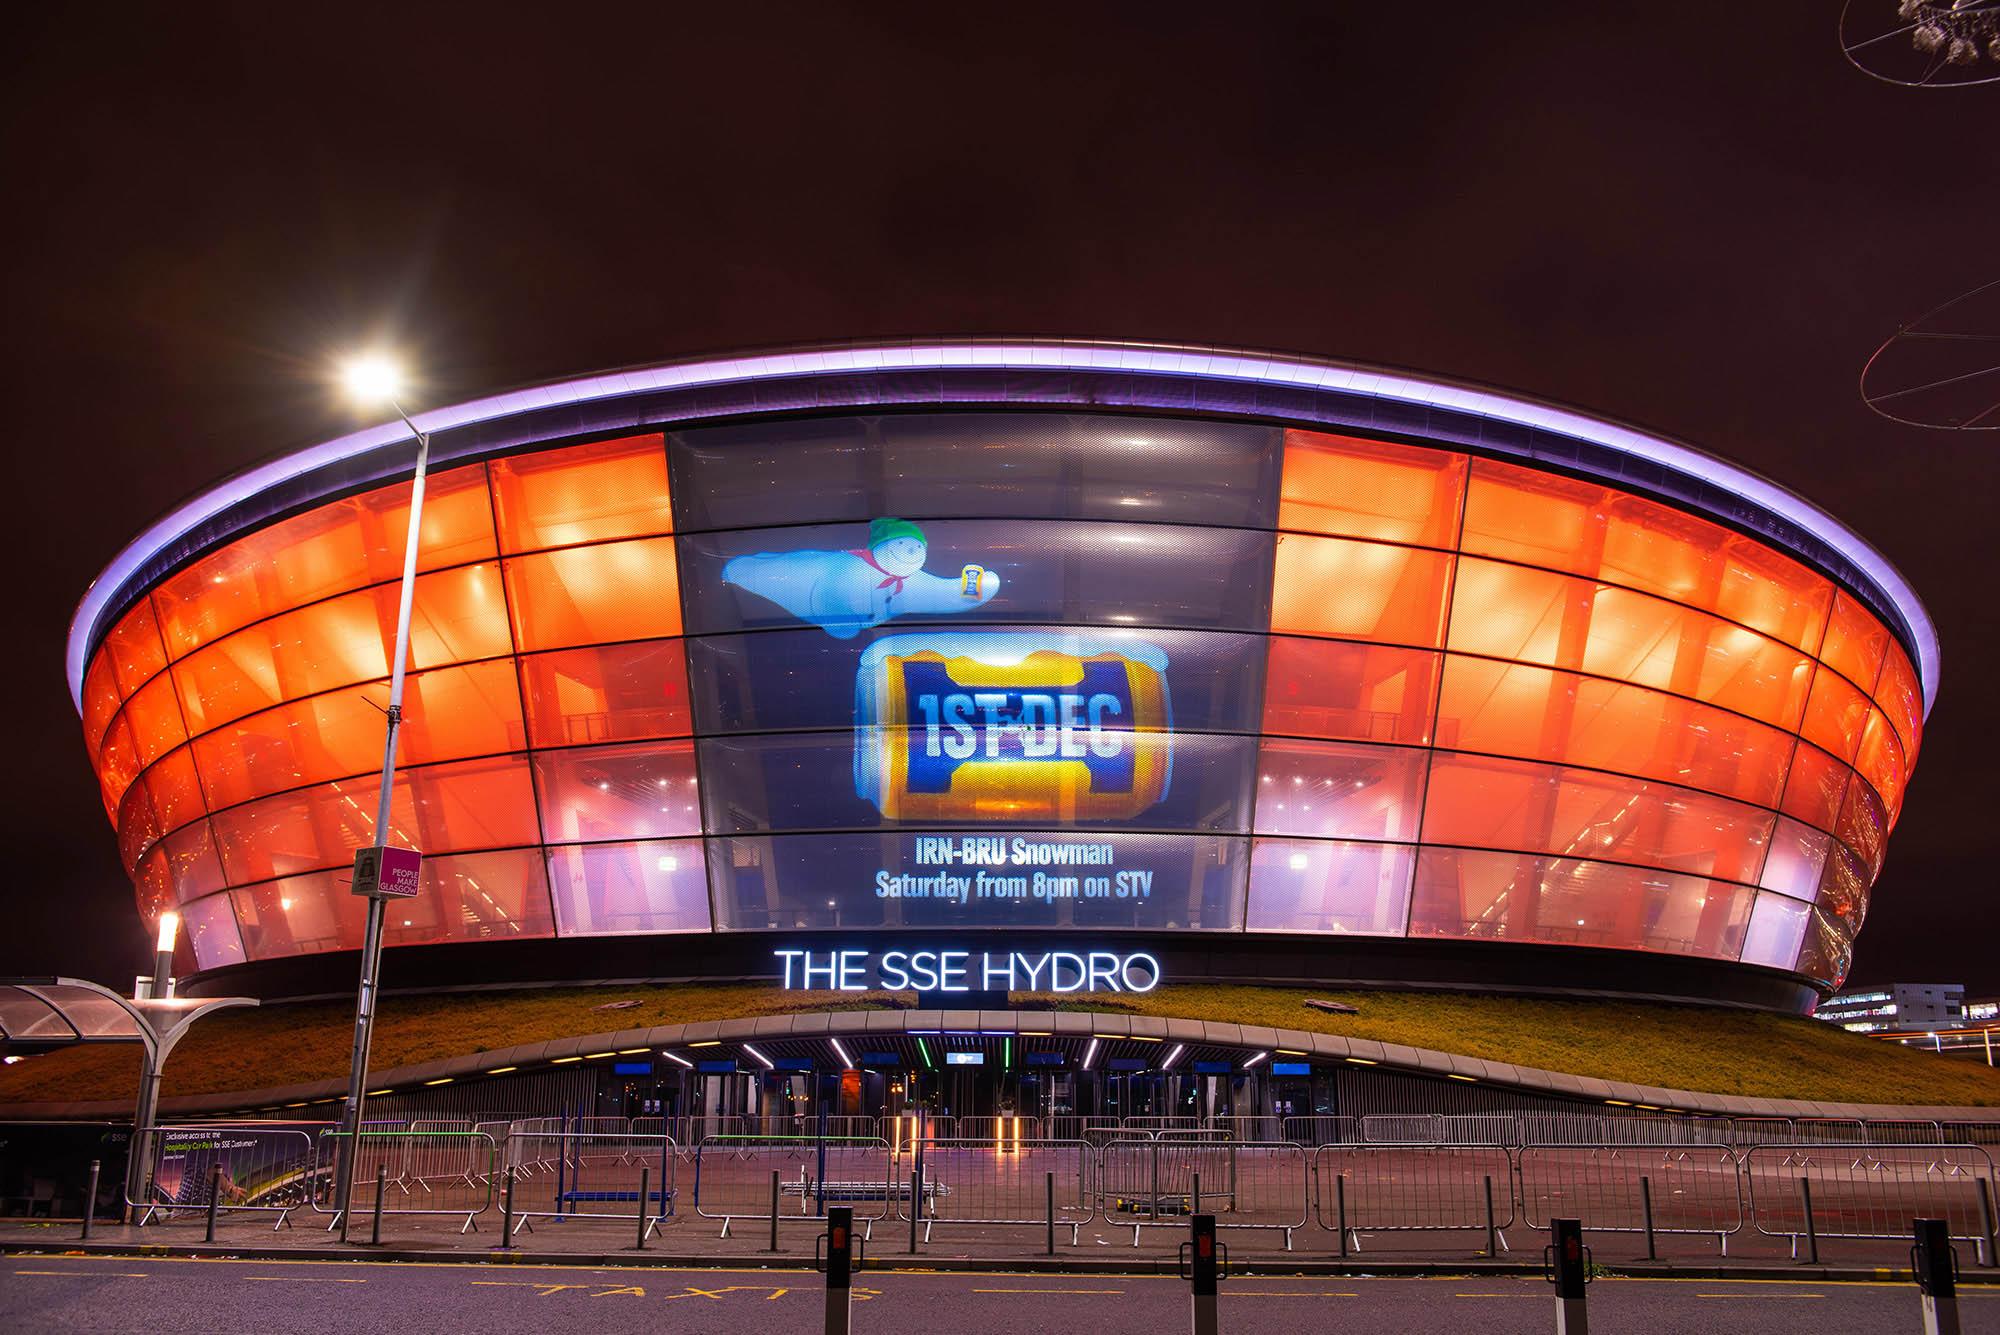 Irn Bru Projection Marketing, on Glasgow SSE Hydro